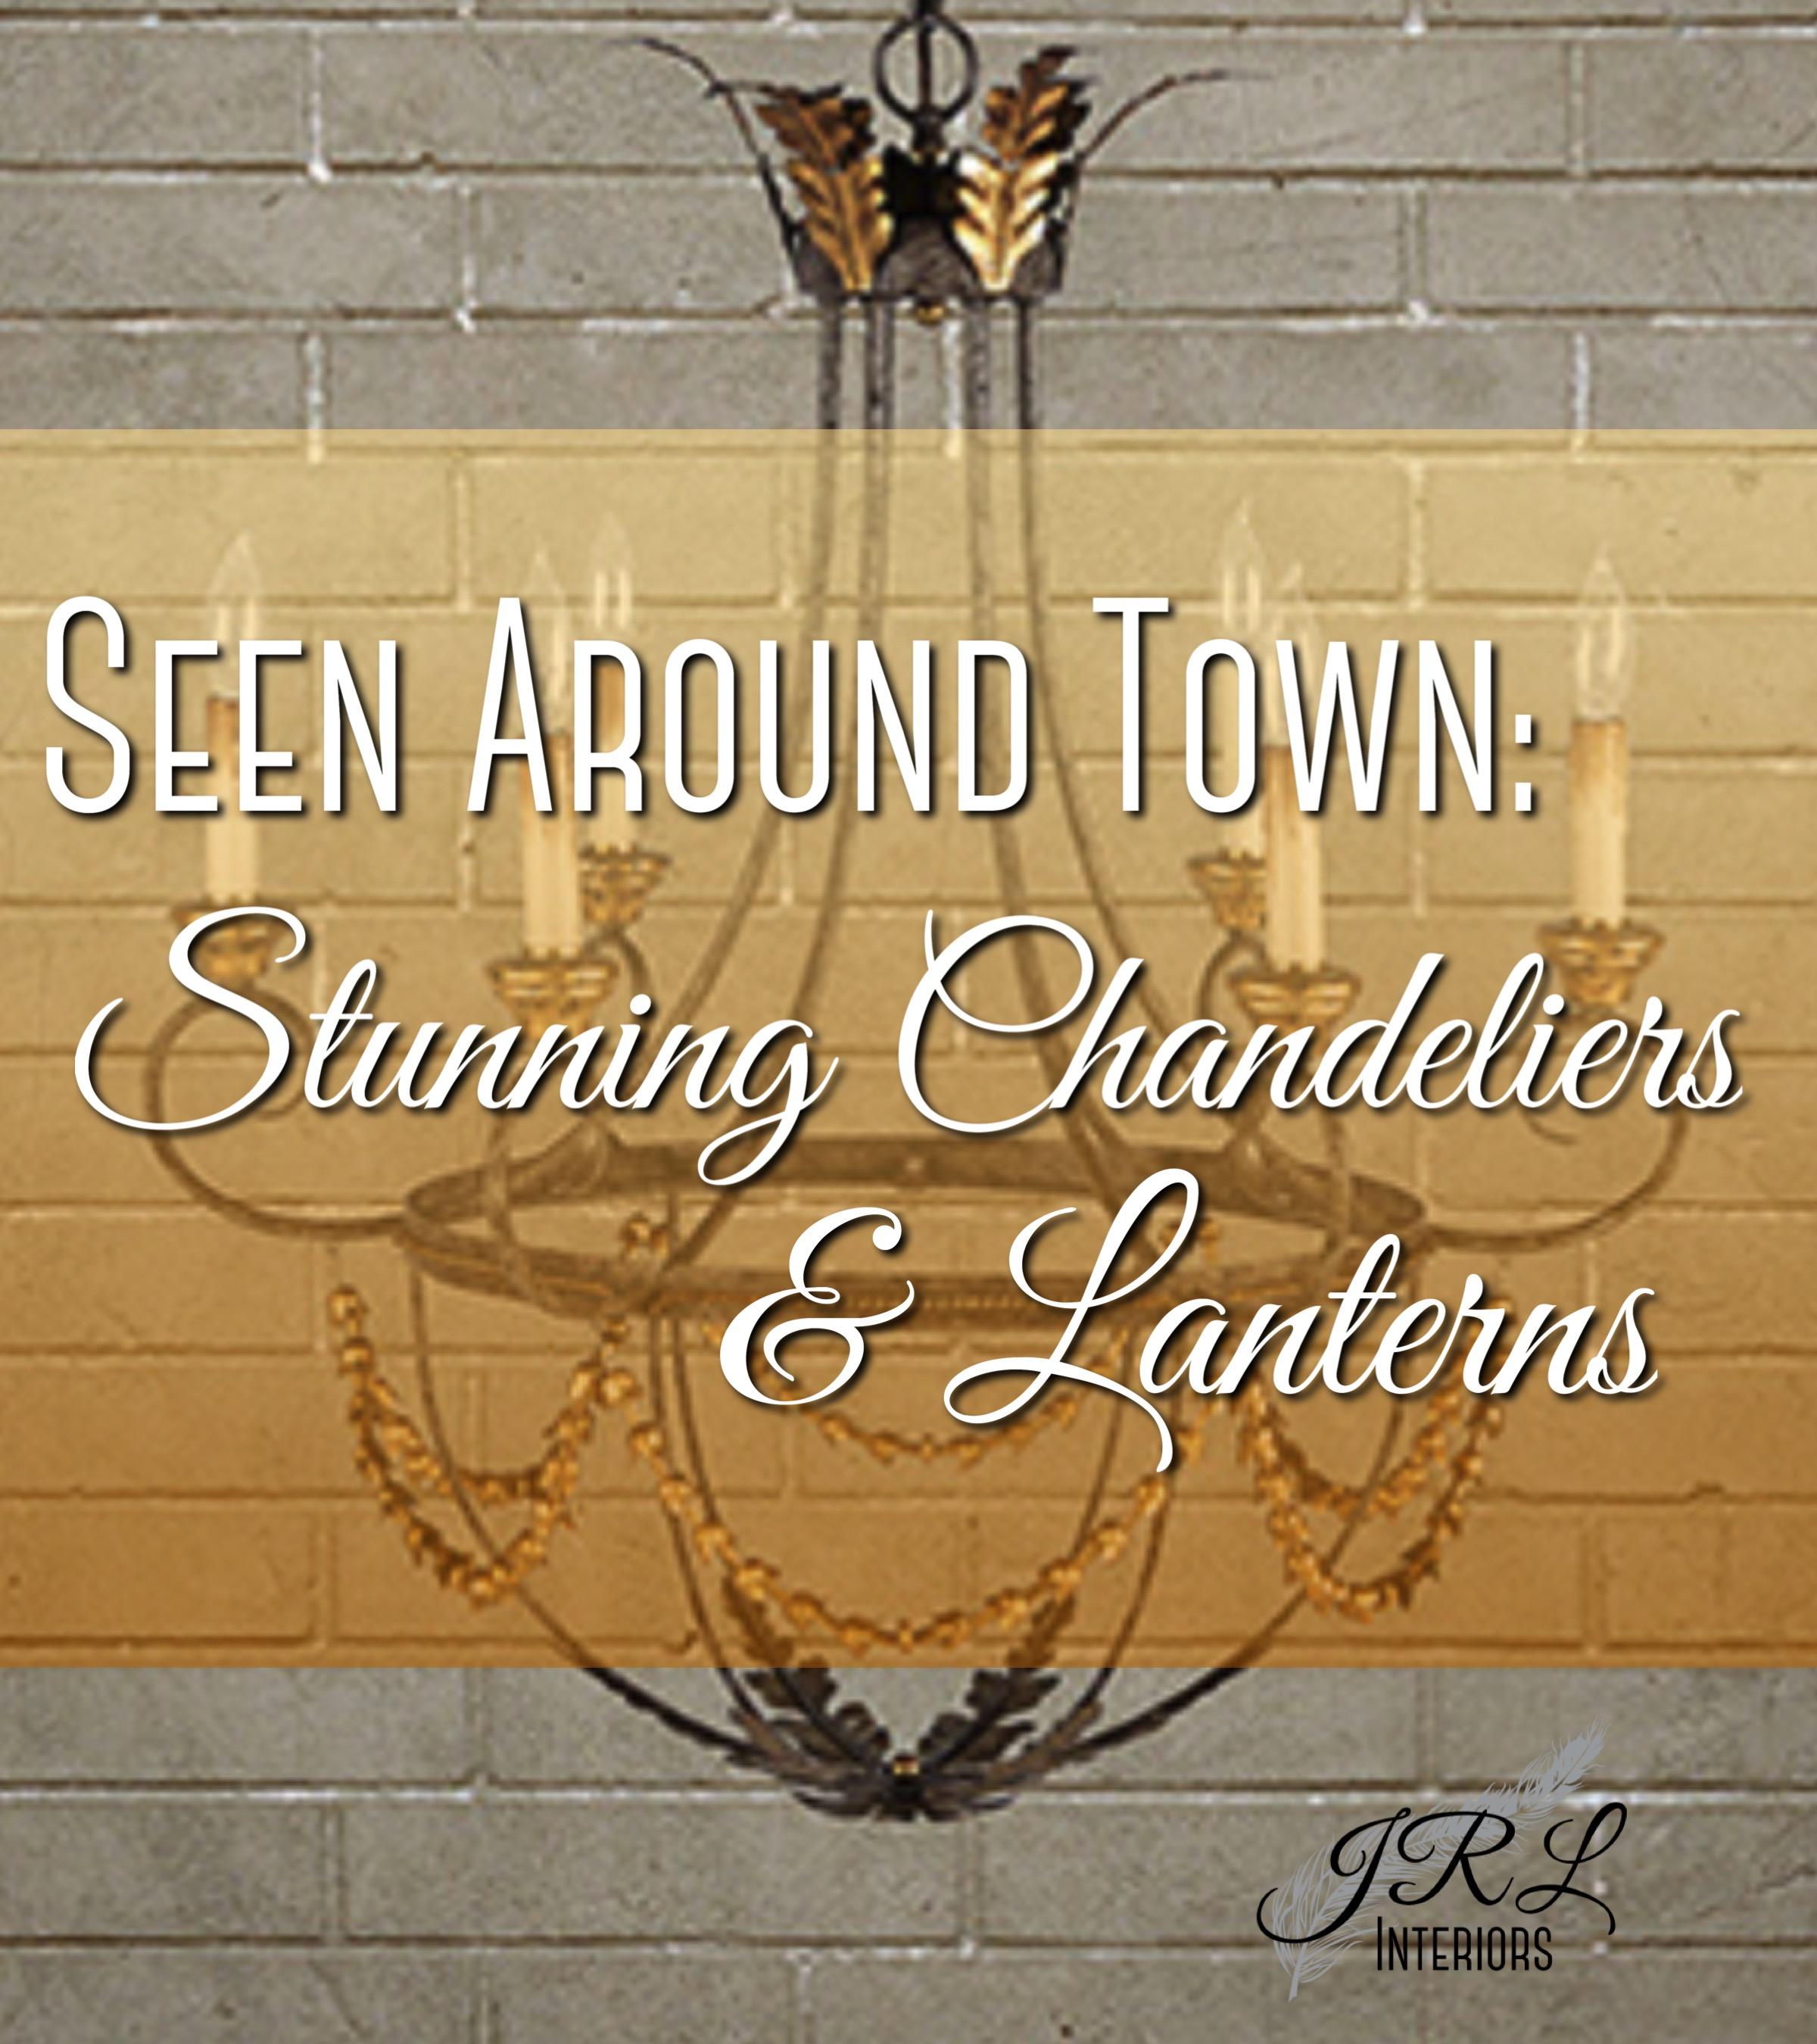 Chandeliers-and-Lanterns-1.jpg